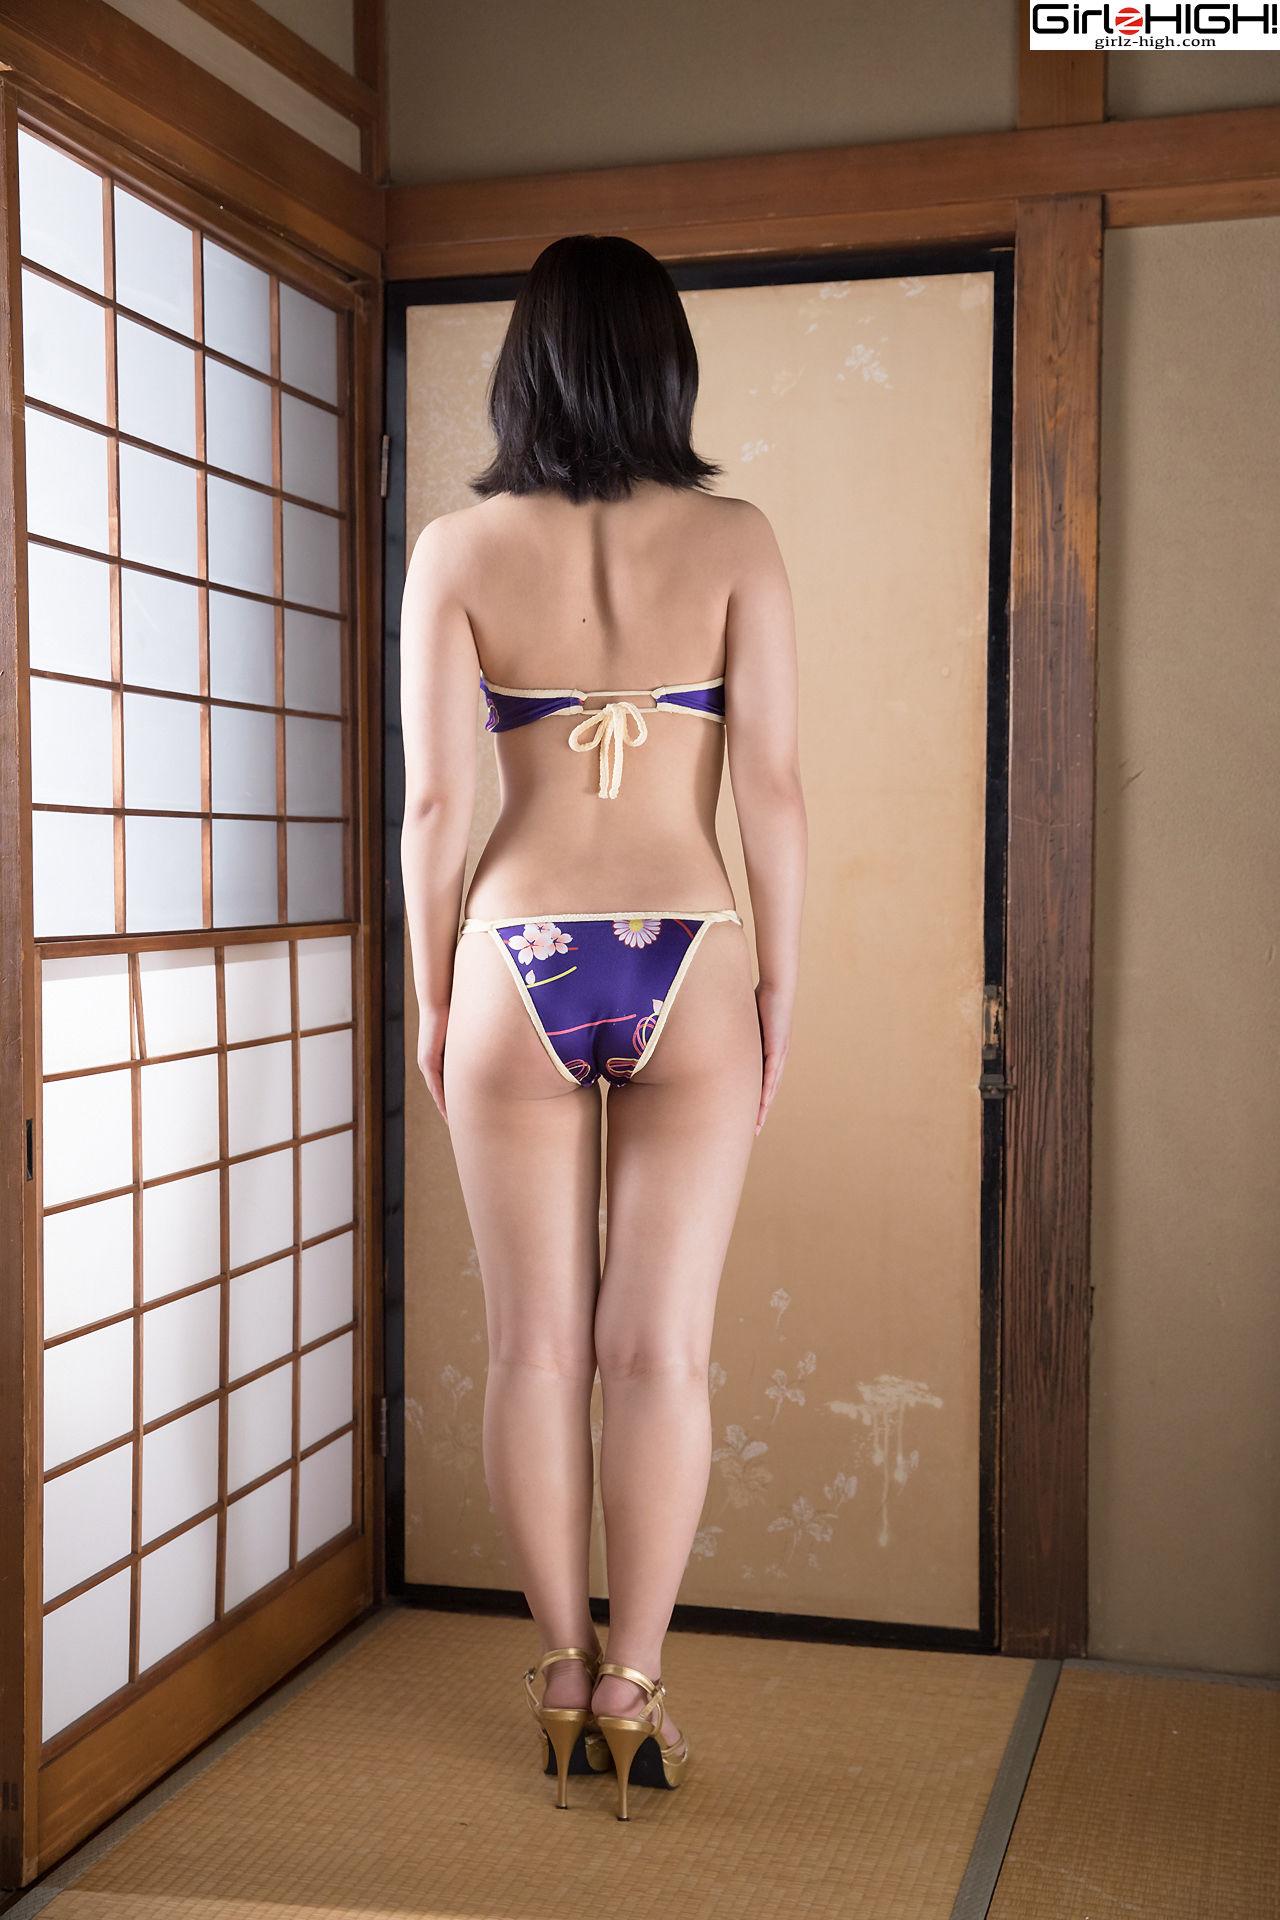 VOL.217 [Girlz-High]泳装:香月杏珠(香月りお)超高清写真套图(67P)